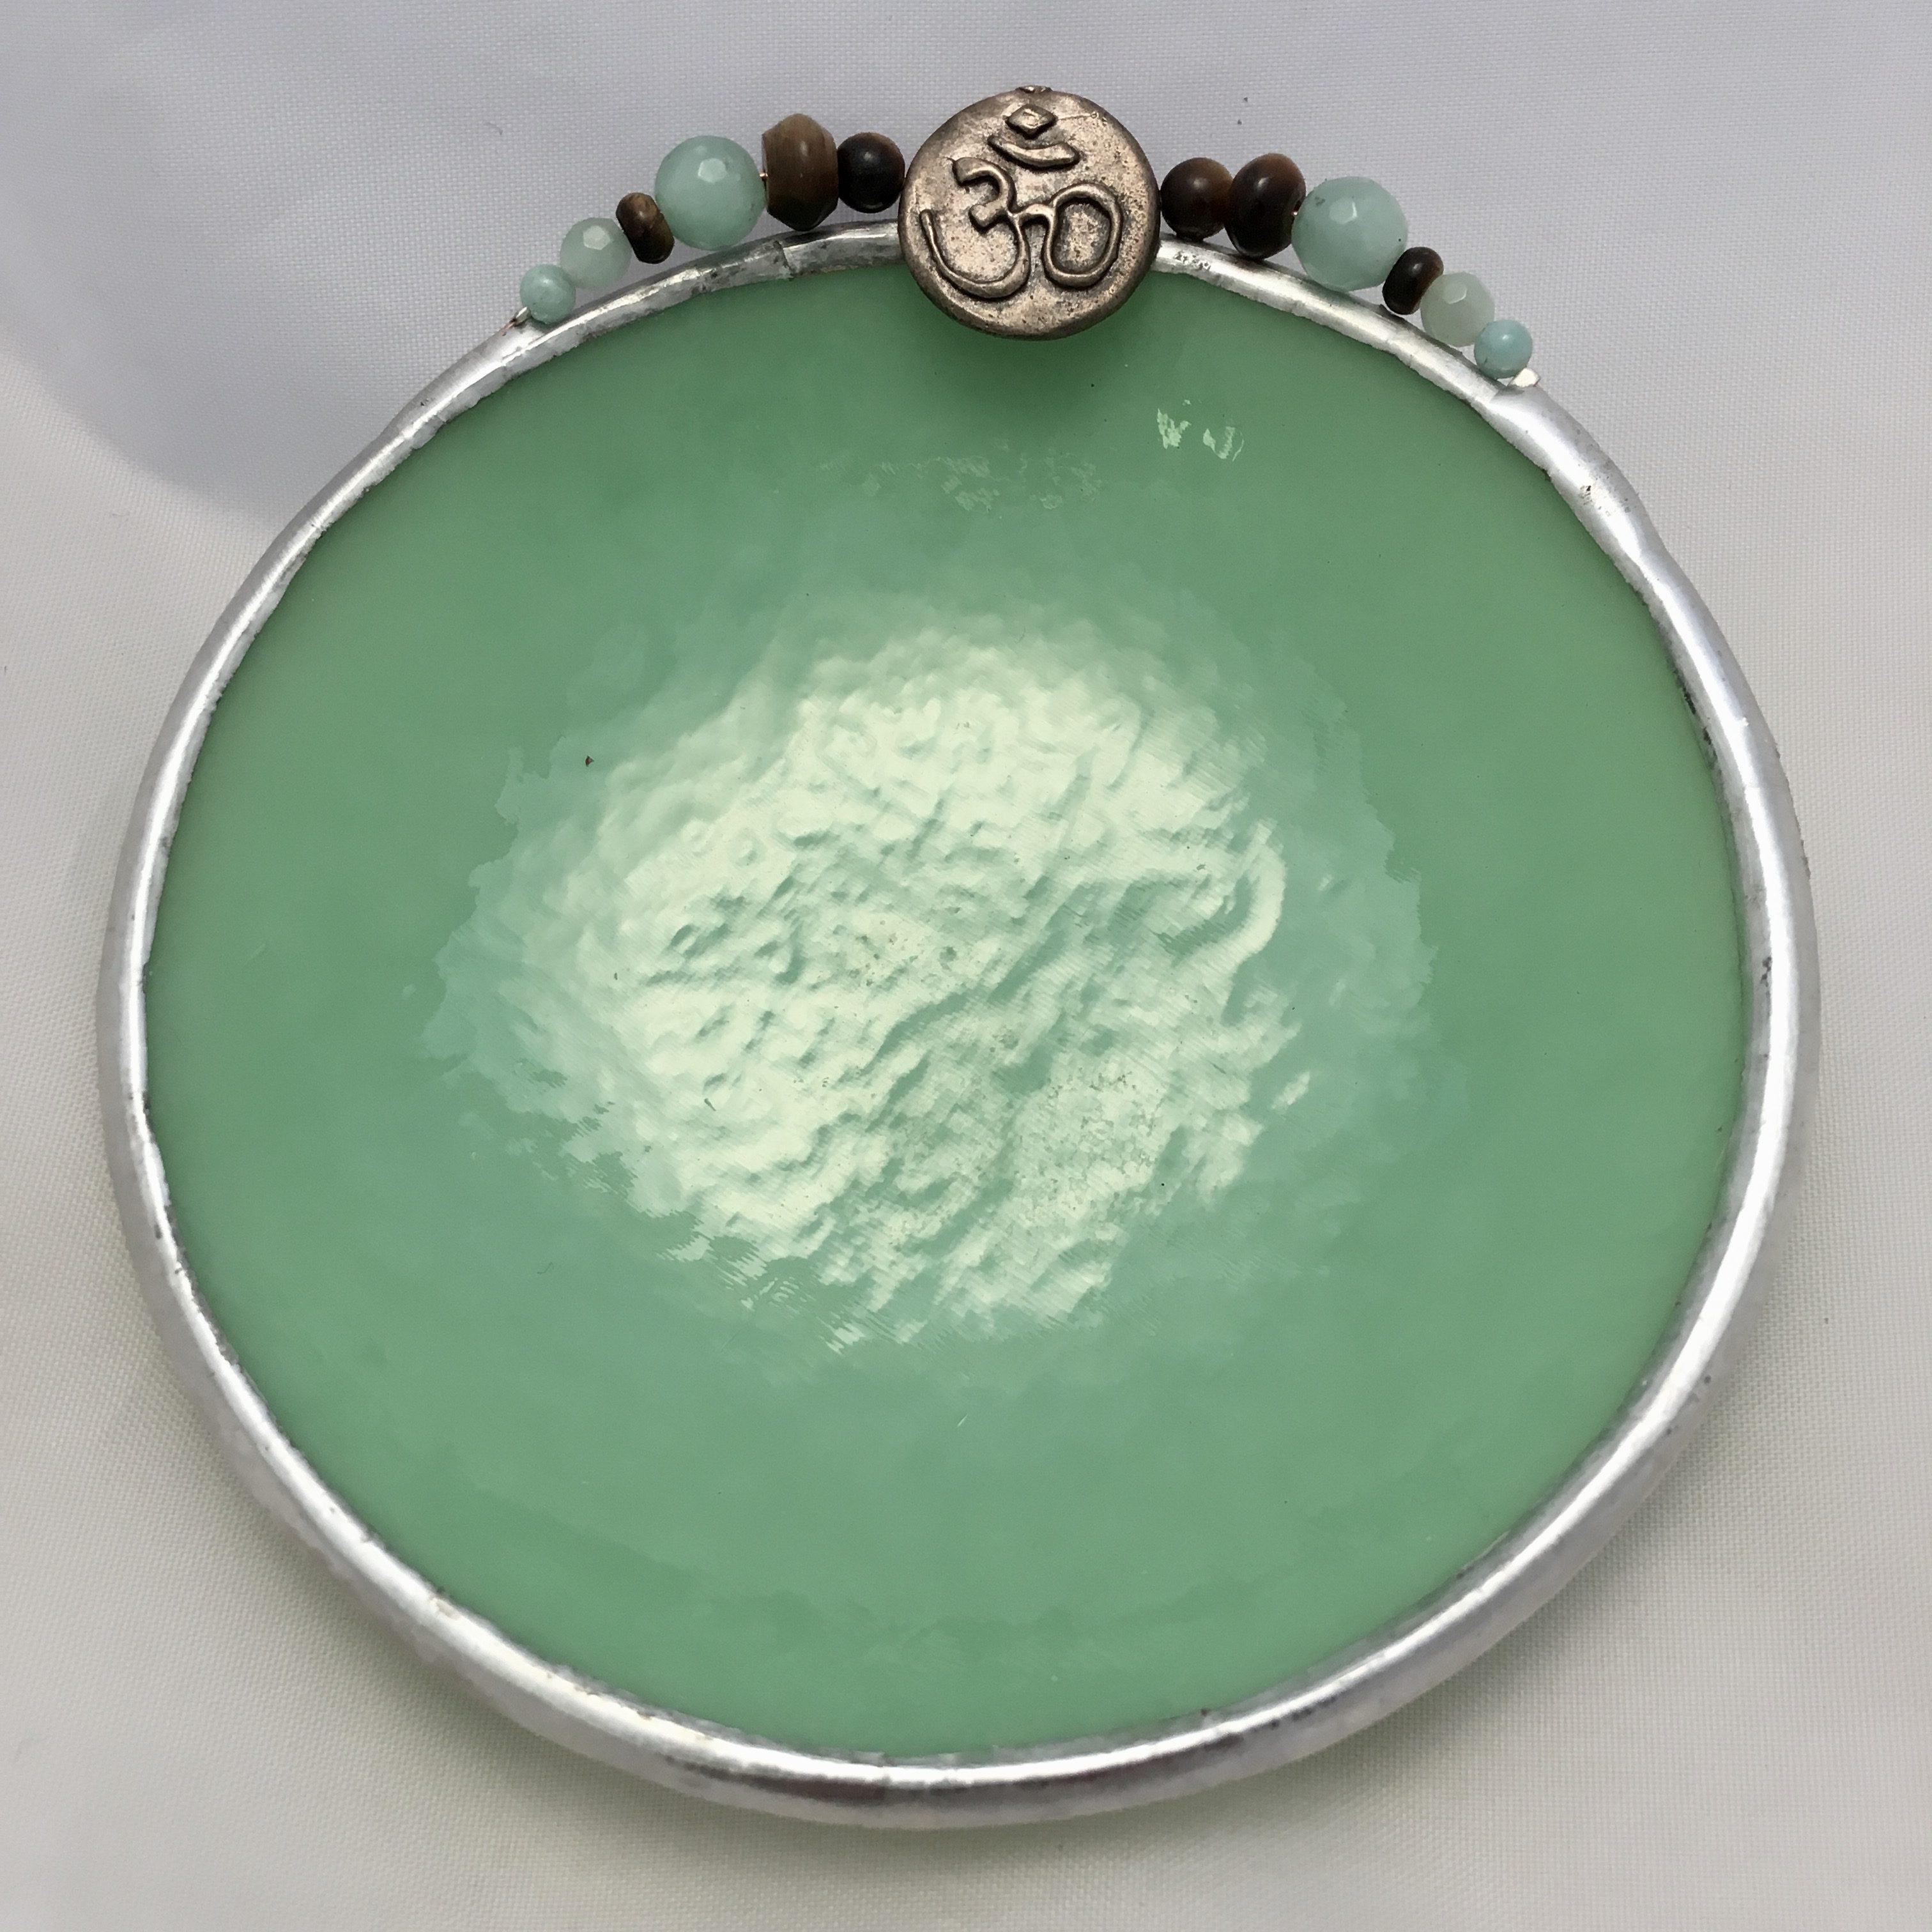 S - green symbol